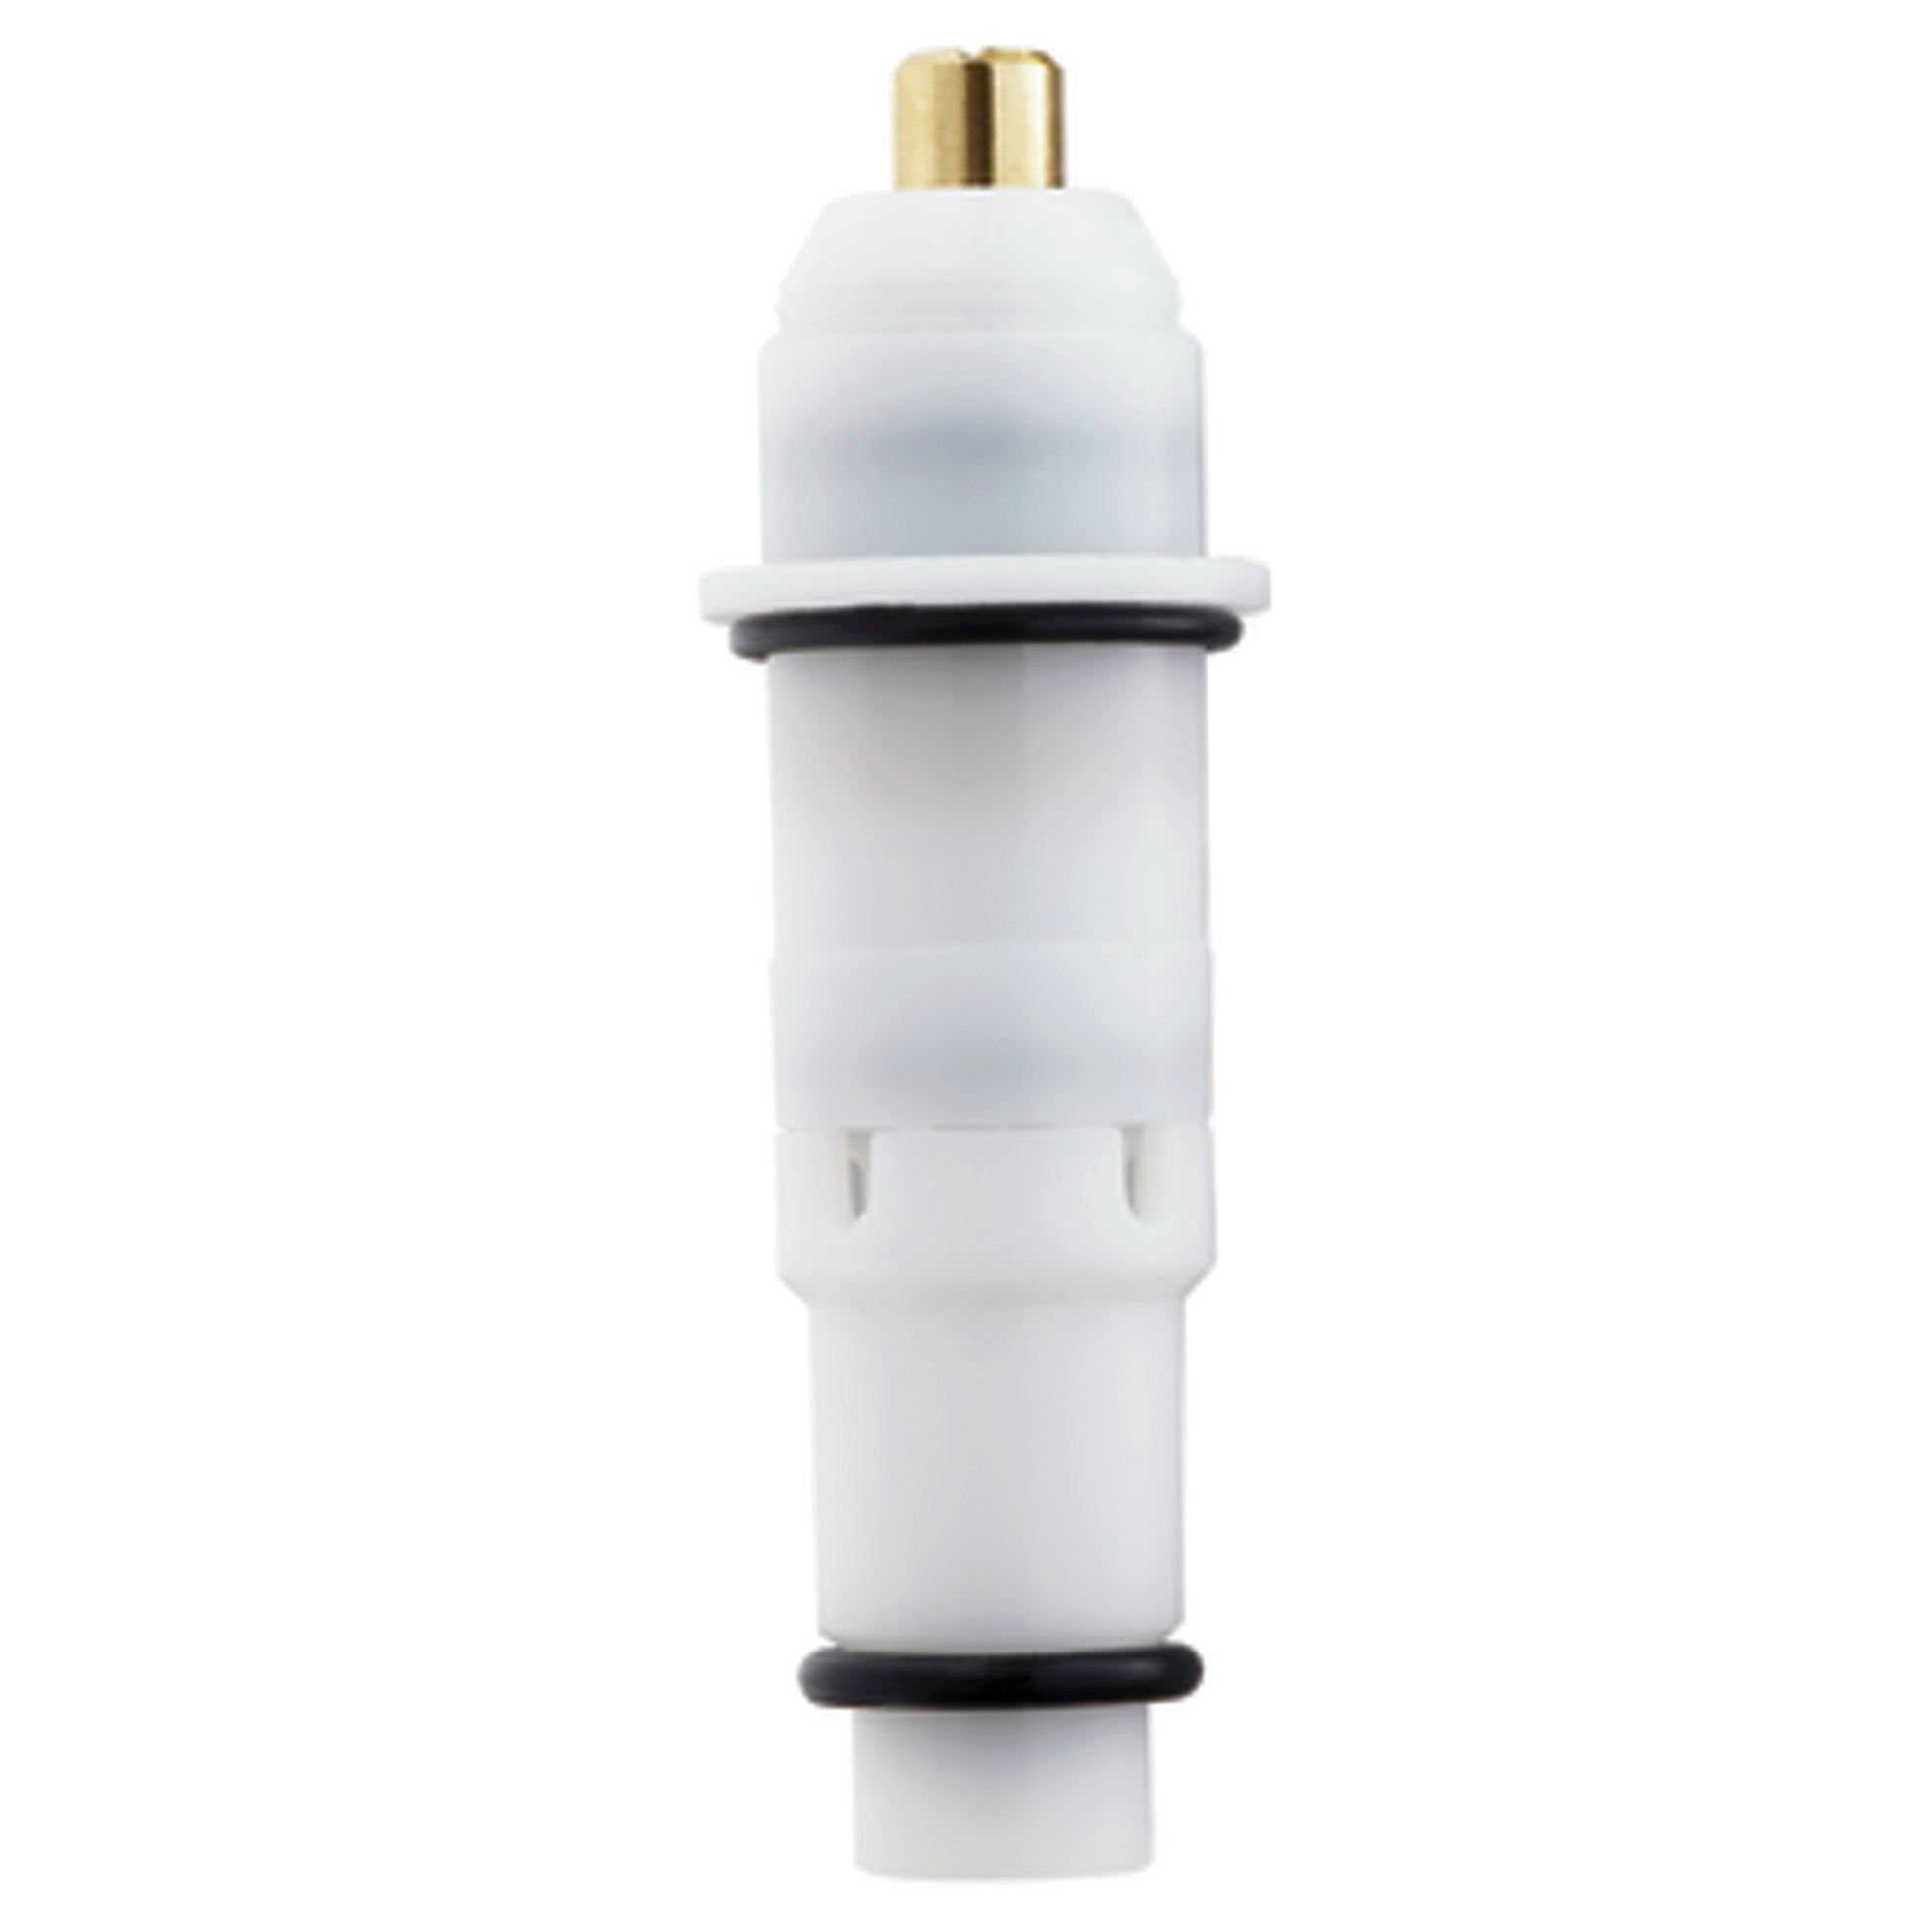 Moen Kitchen Faucet Cartridge